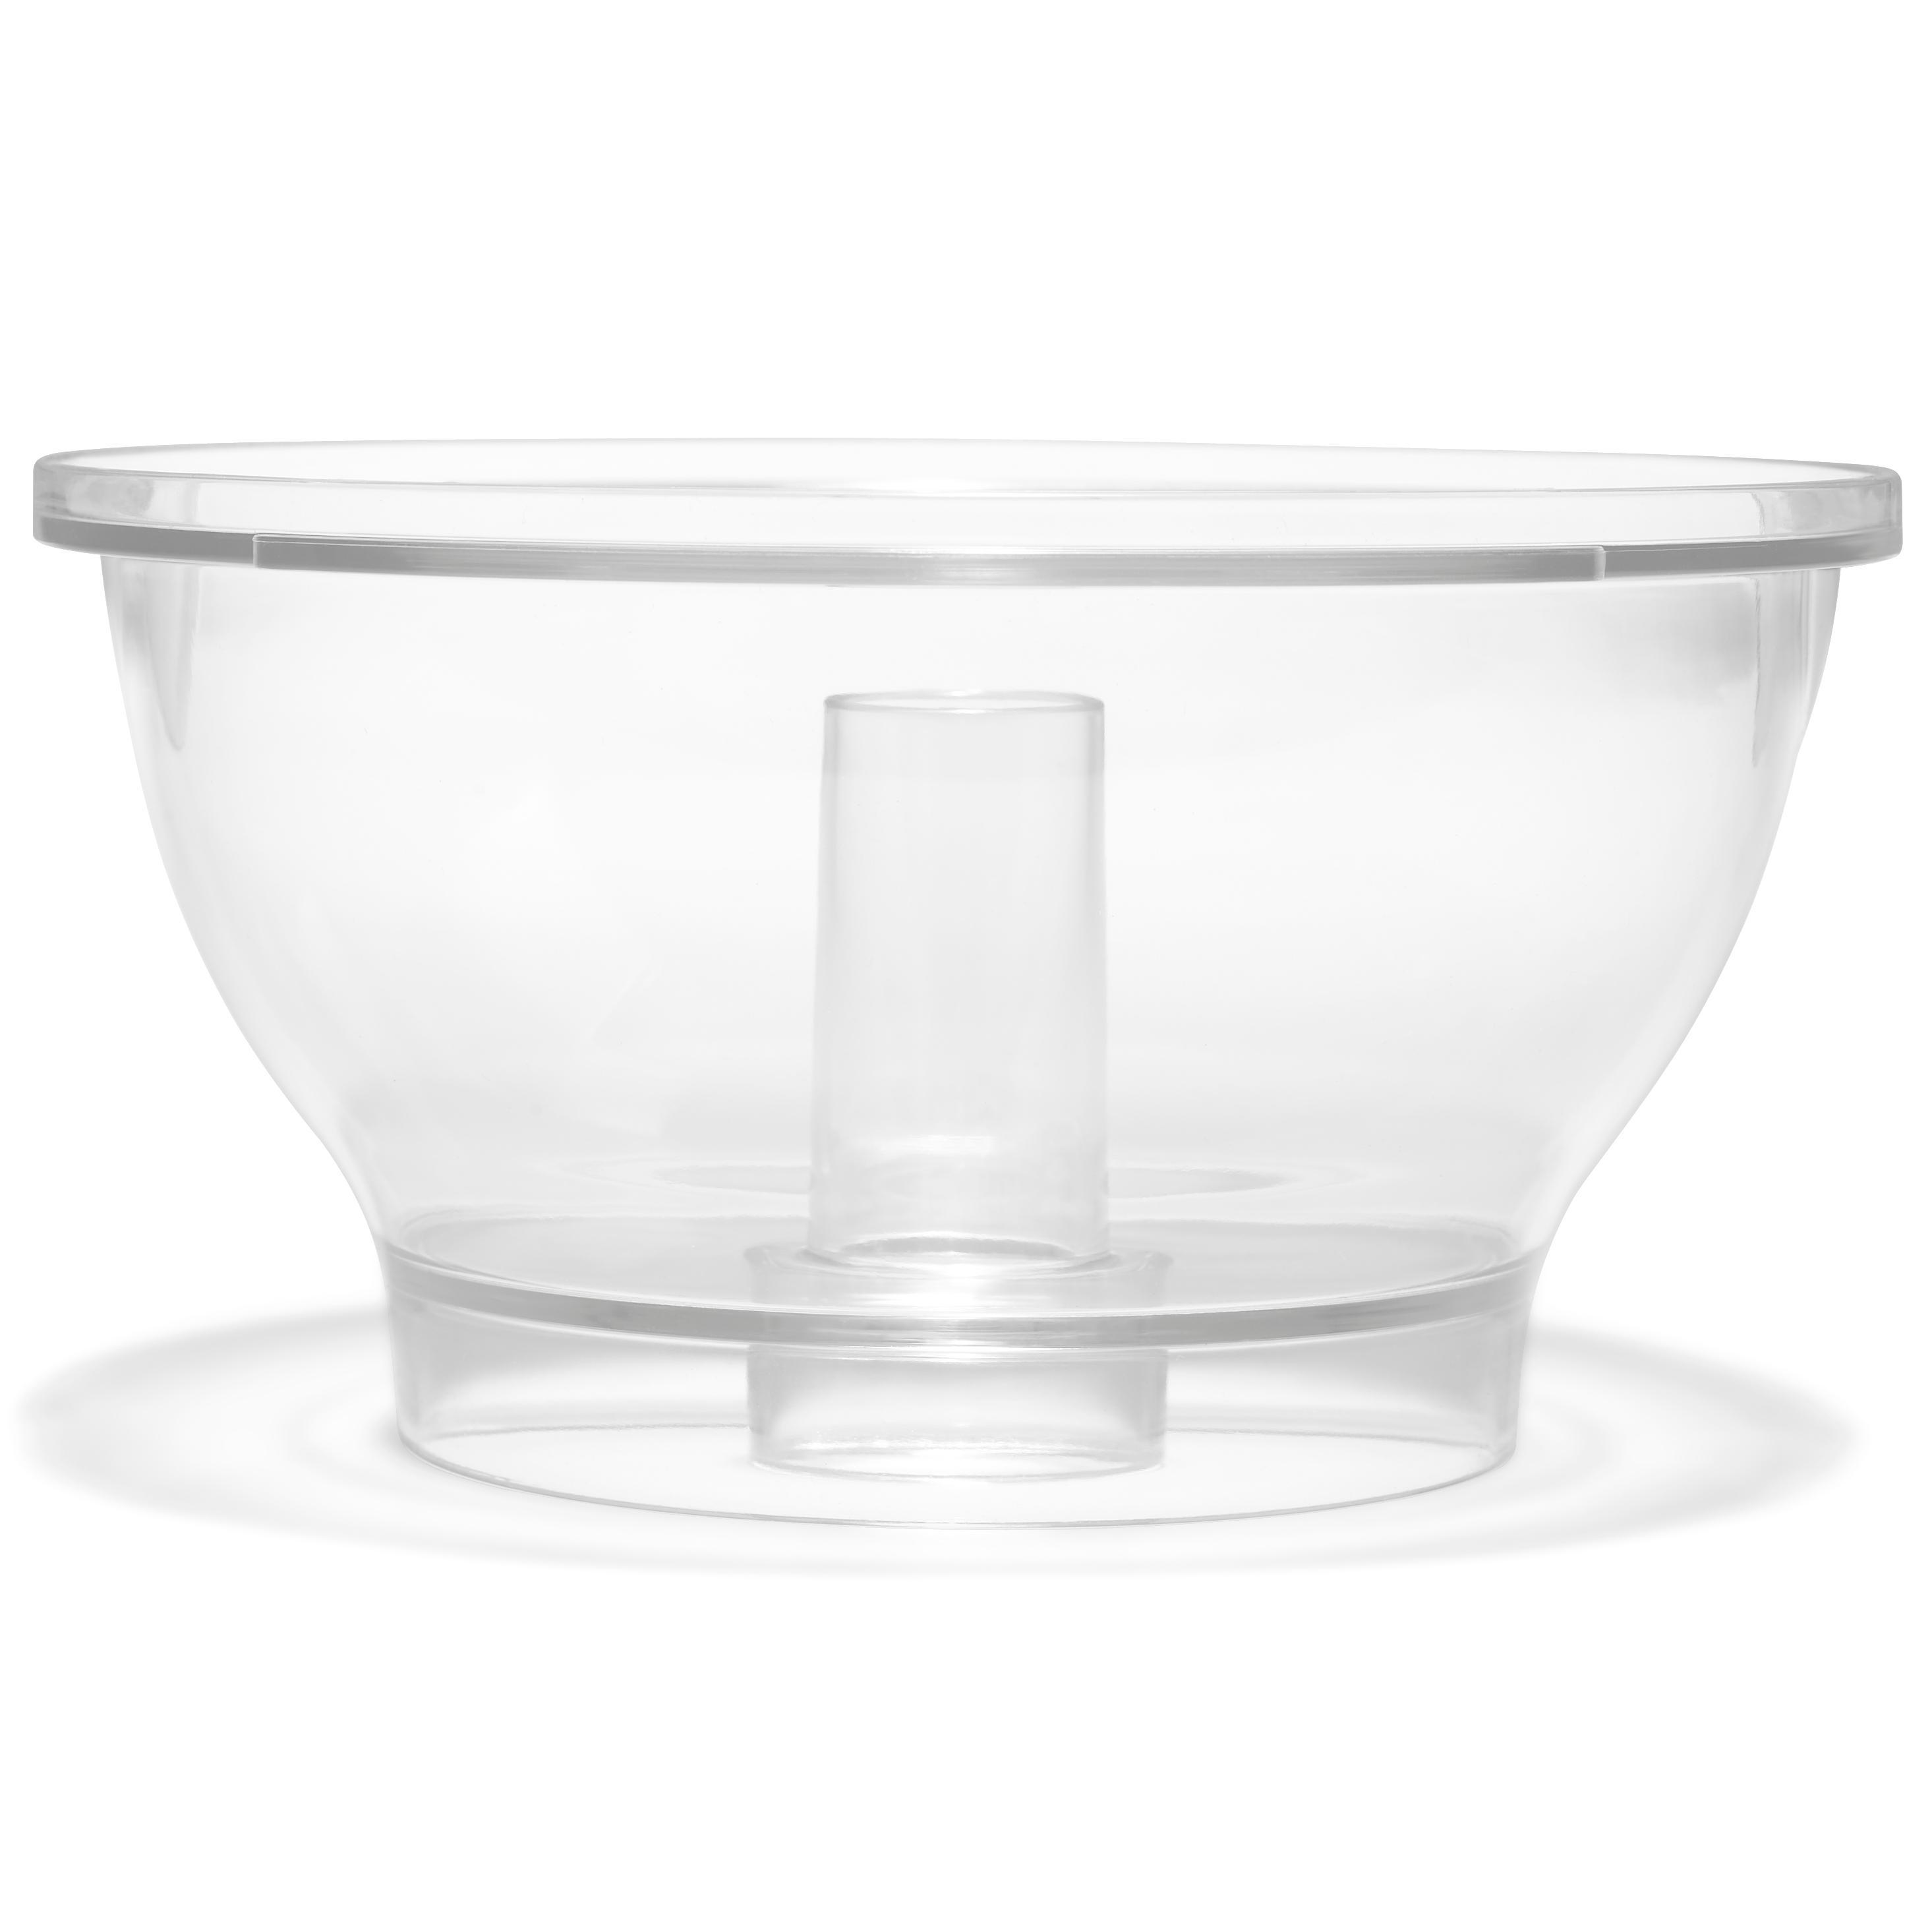 Amazon.com: KitchenAid KFP720OB 7-Cup Food Processor with 3-Cup ...